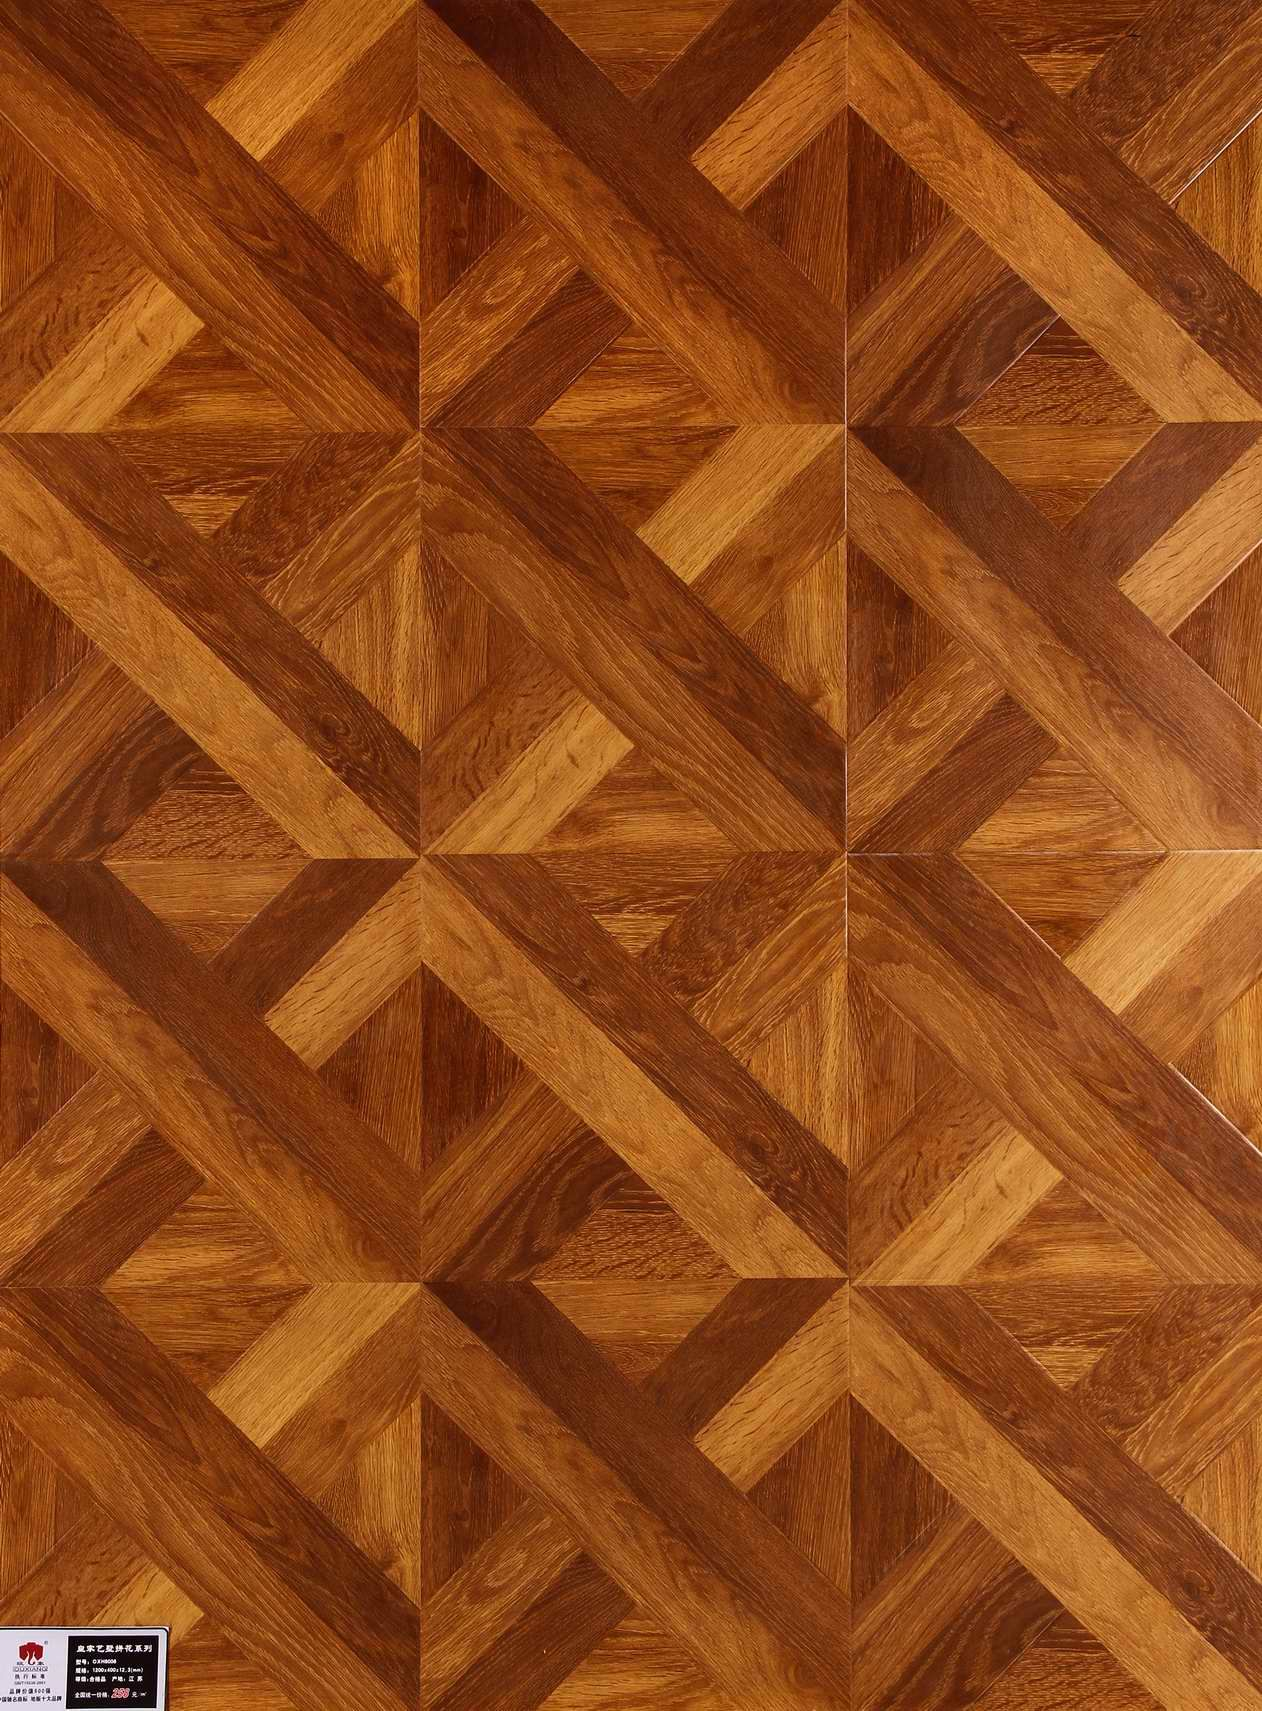 Hot Item Parquet Flooring Oxh8006 Flooring Parquet Flooring Wooden Floor Pattern